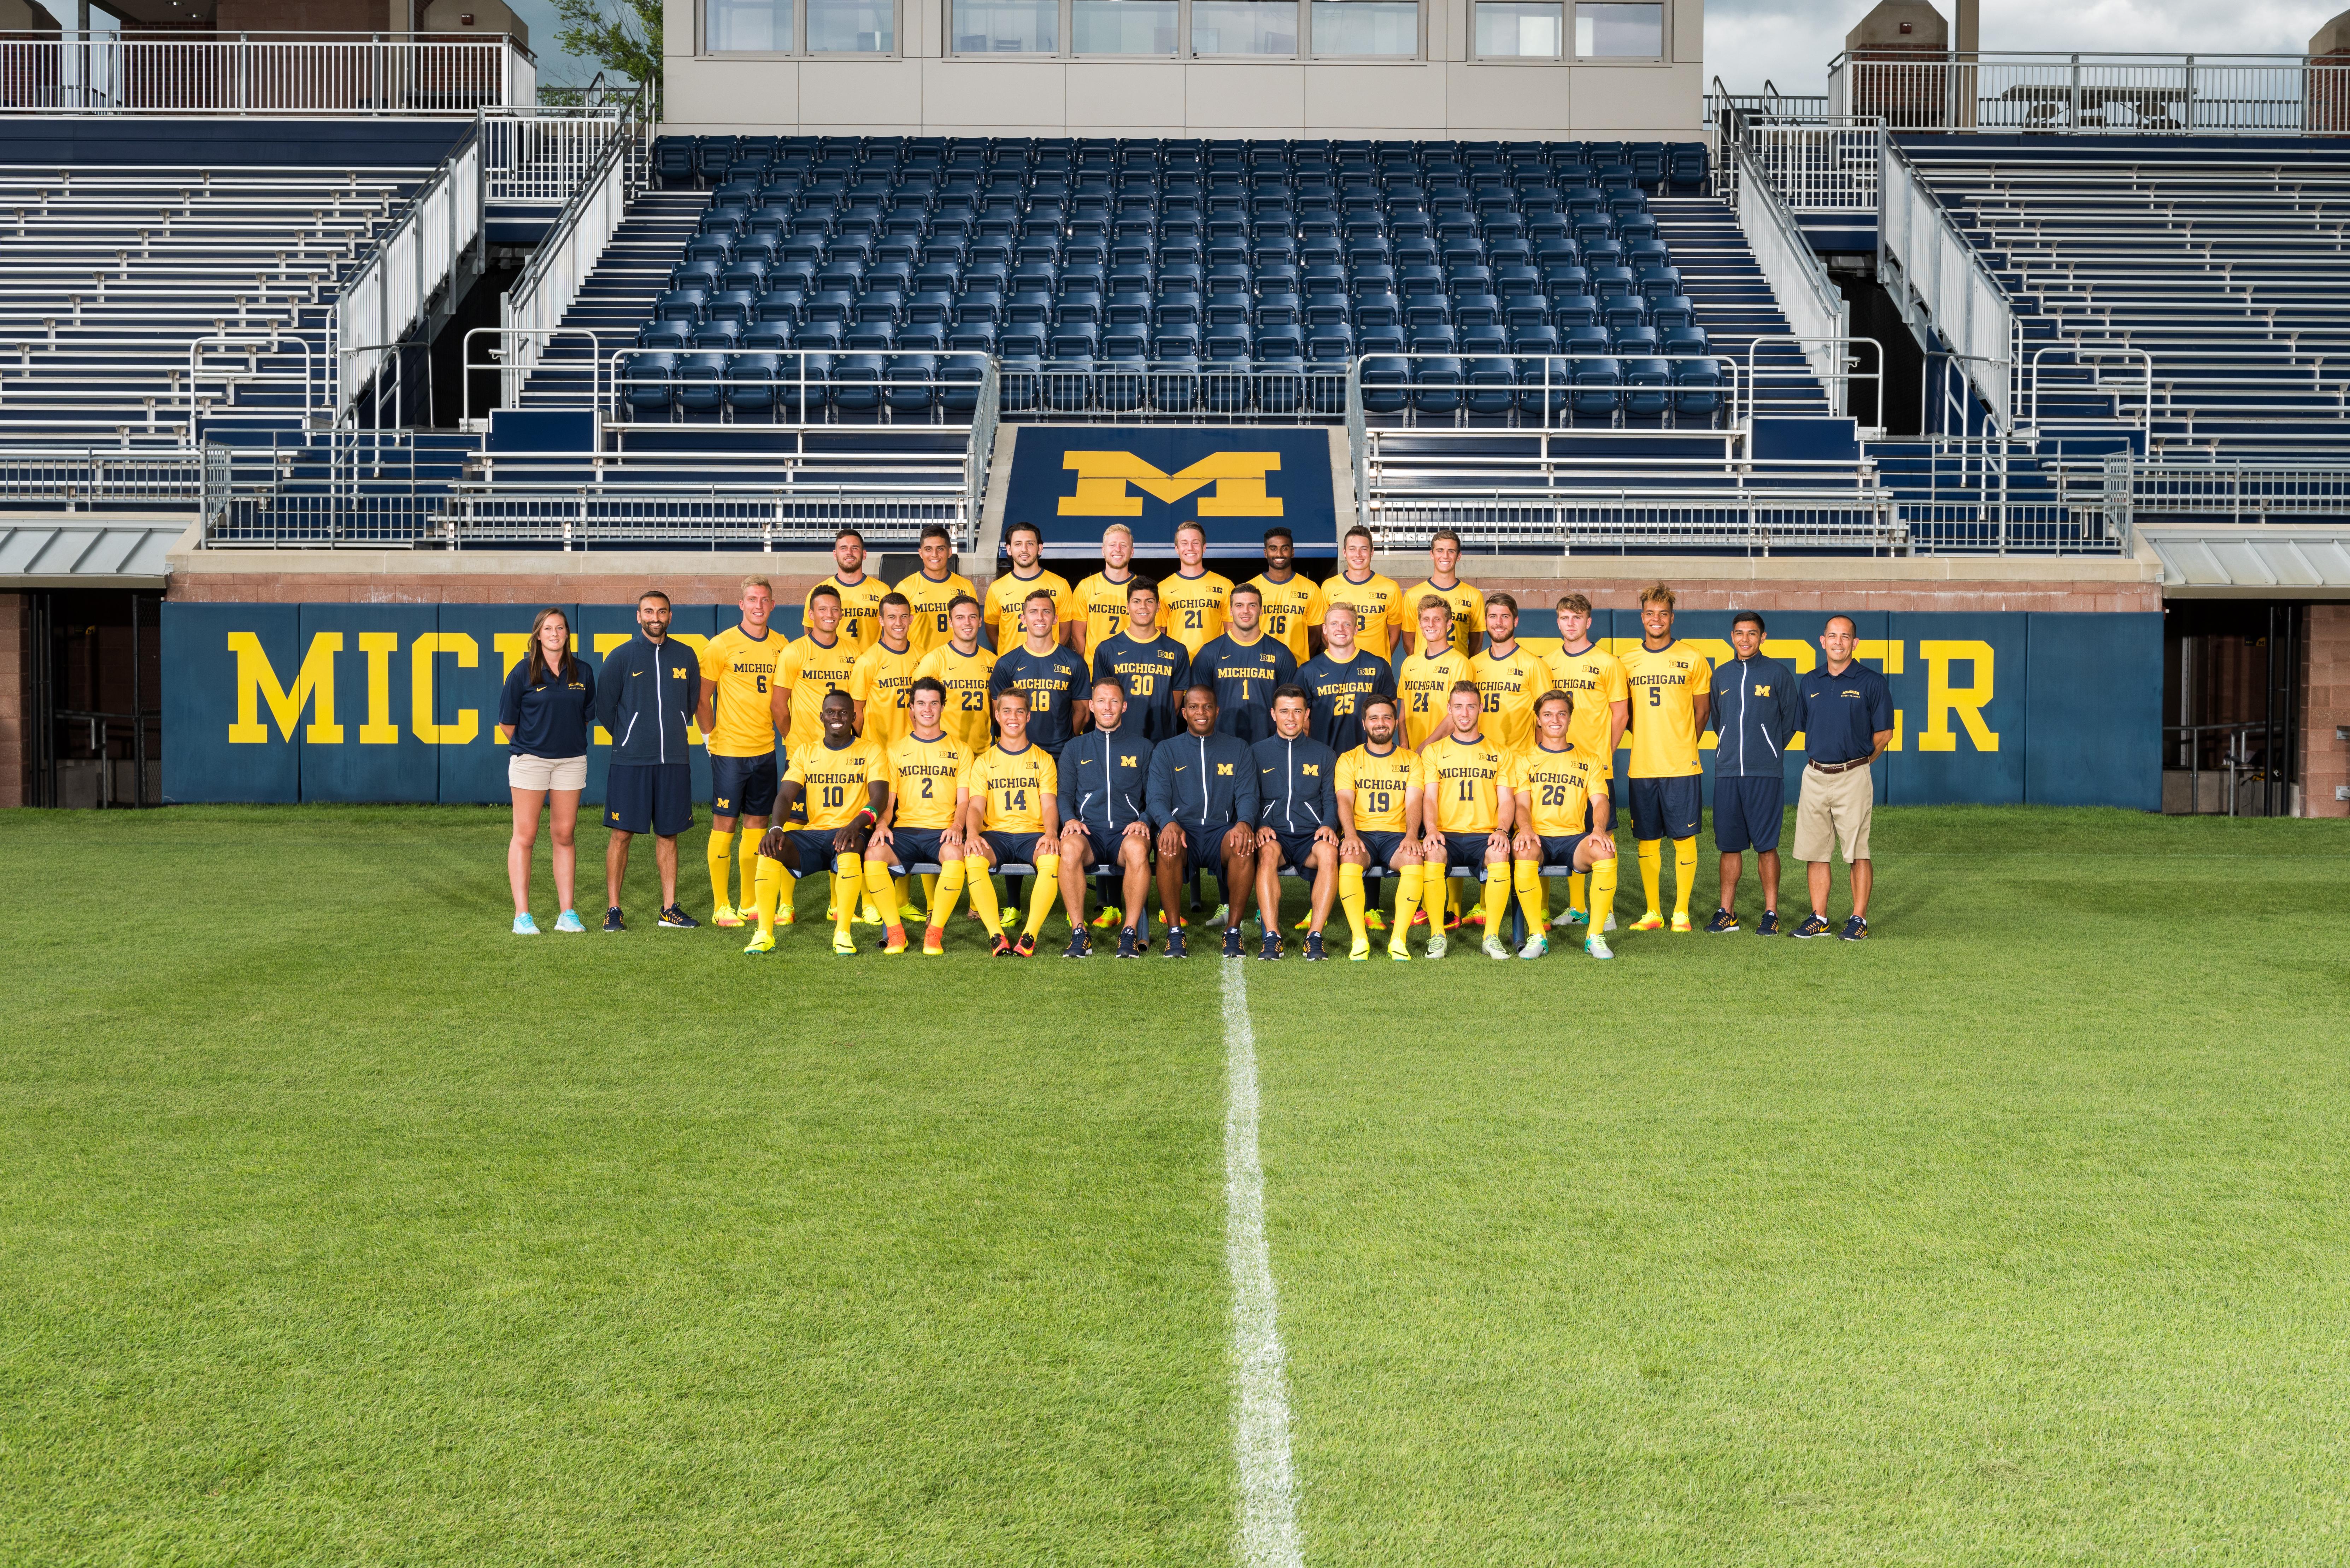 ab66b05f200 2016 Michigan Men s Soccer Season Preview by Michigan Athletics